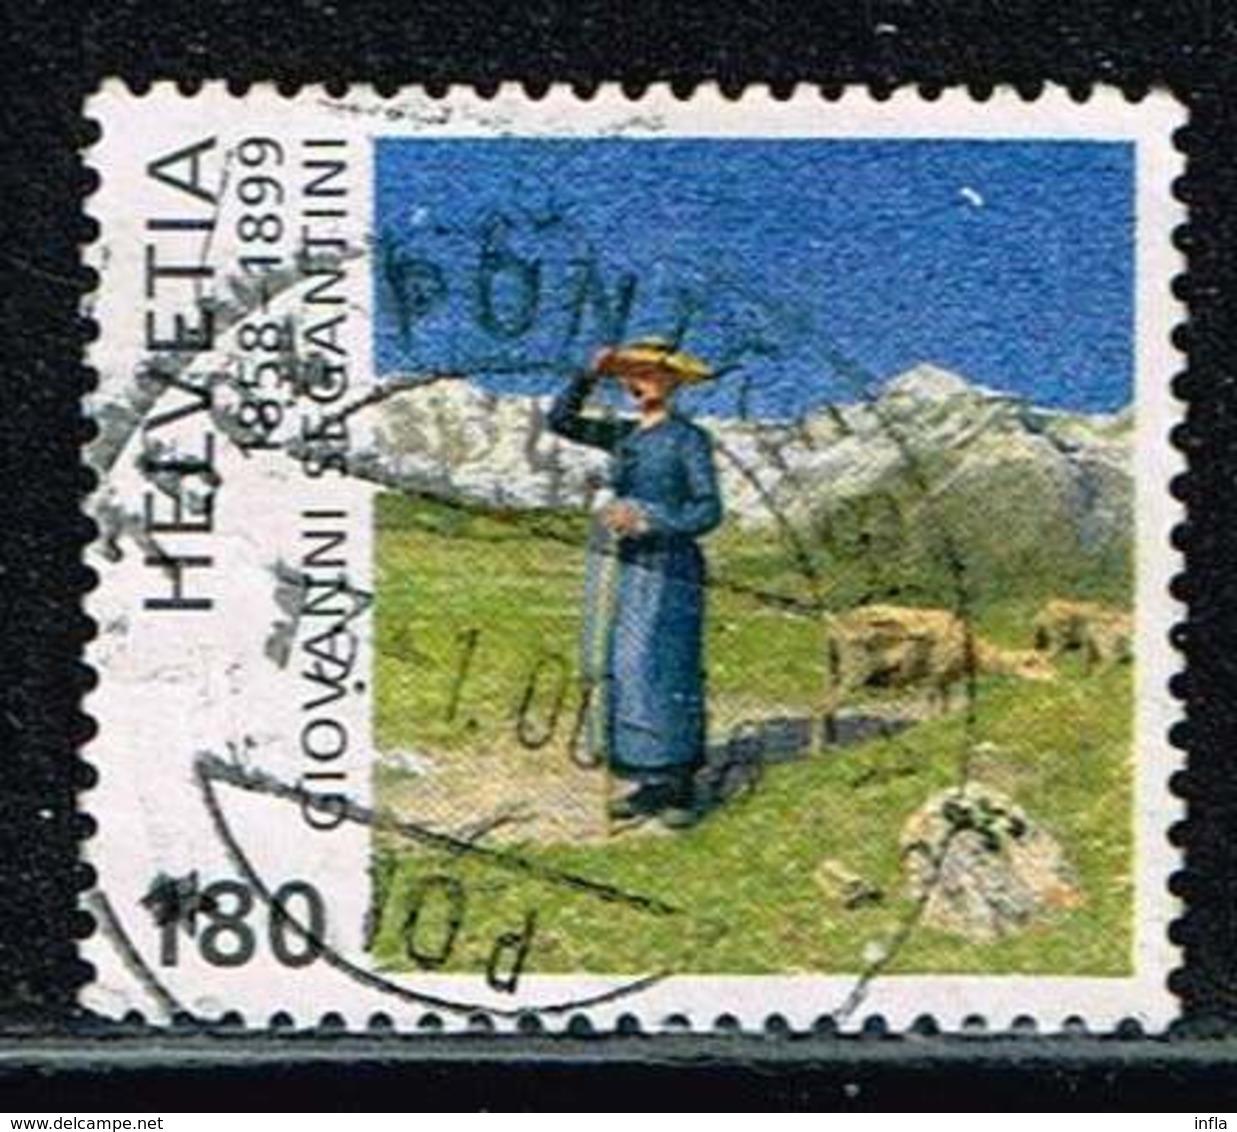 "Schweiz 1999, Michel# 1698 O ""Noon In The Alps"" By G. Segantini (1858-99) - Schweiz"